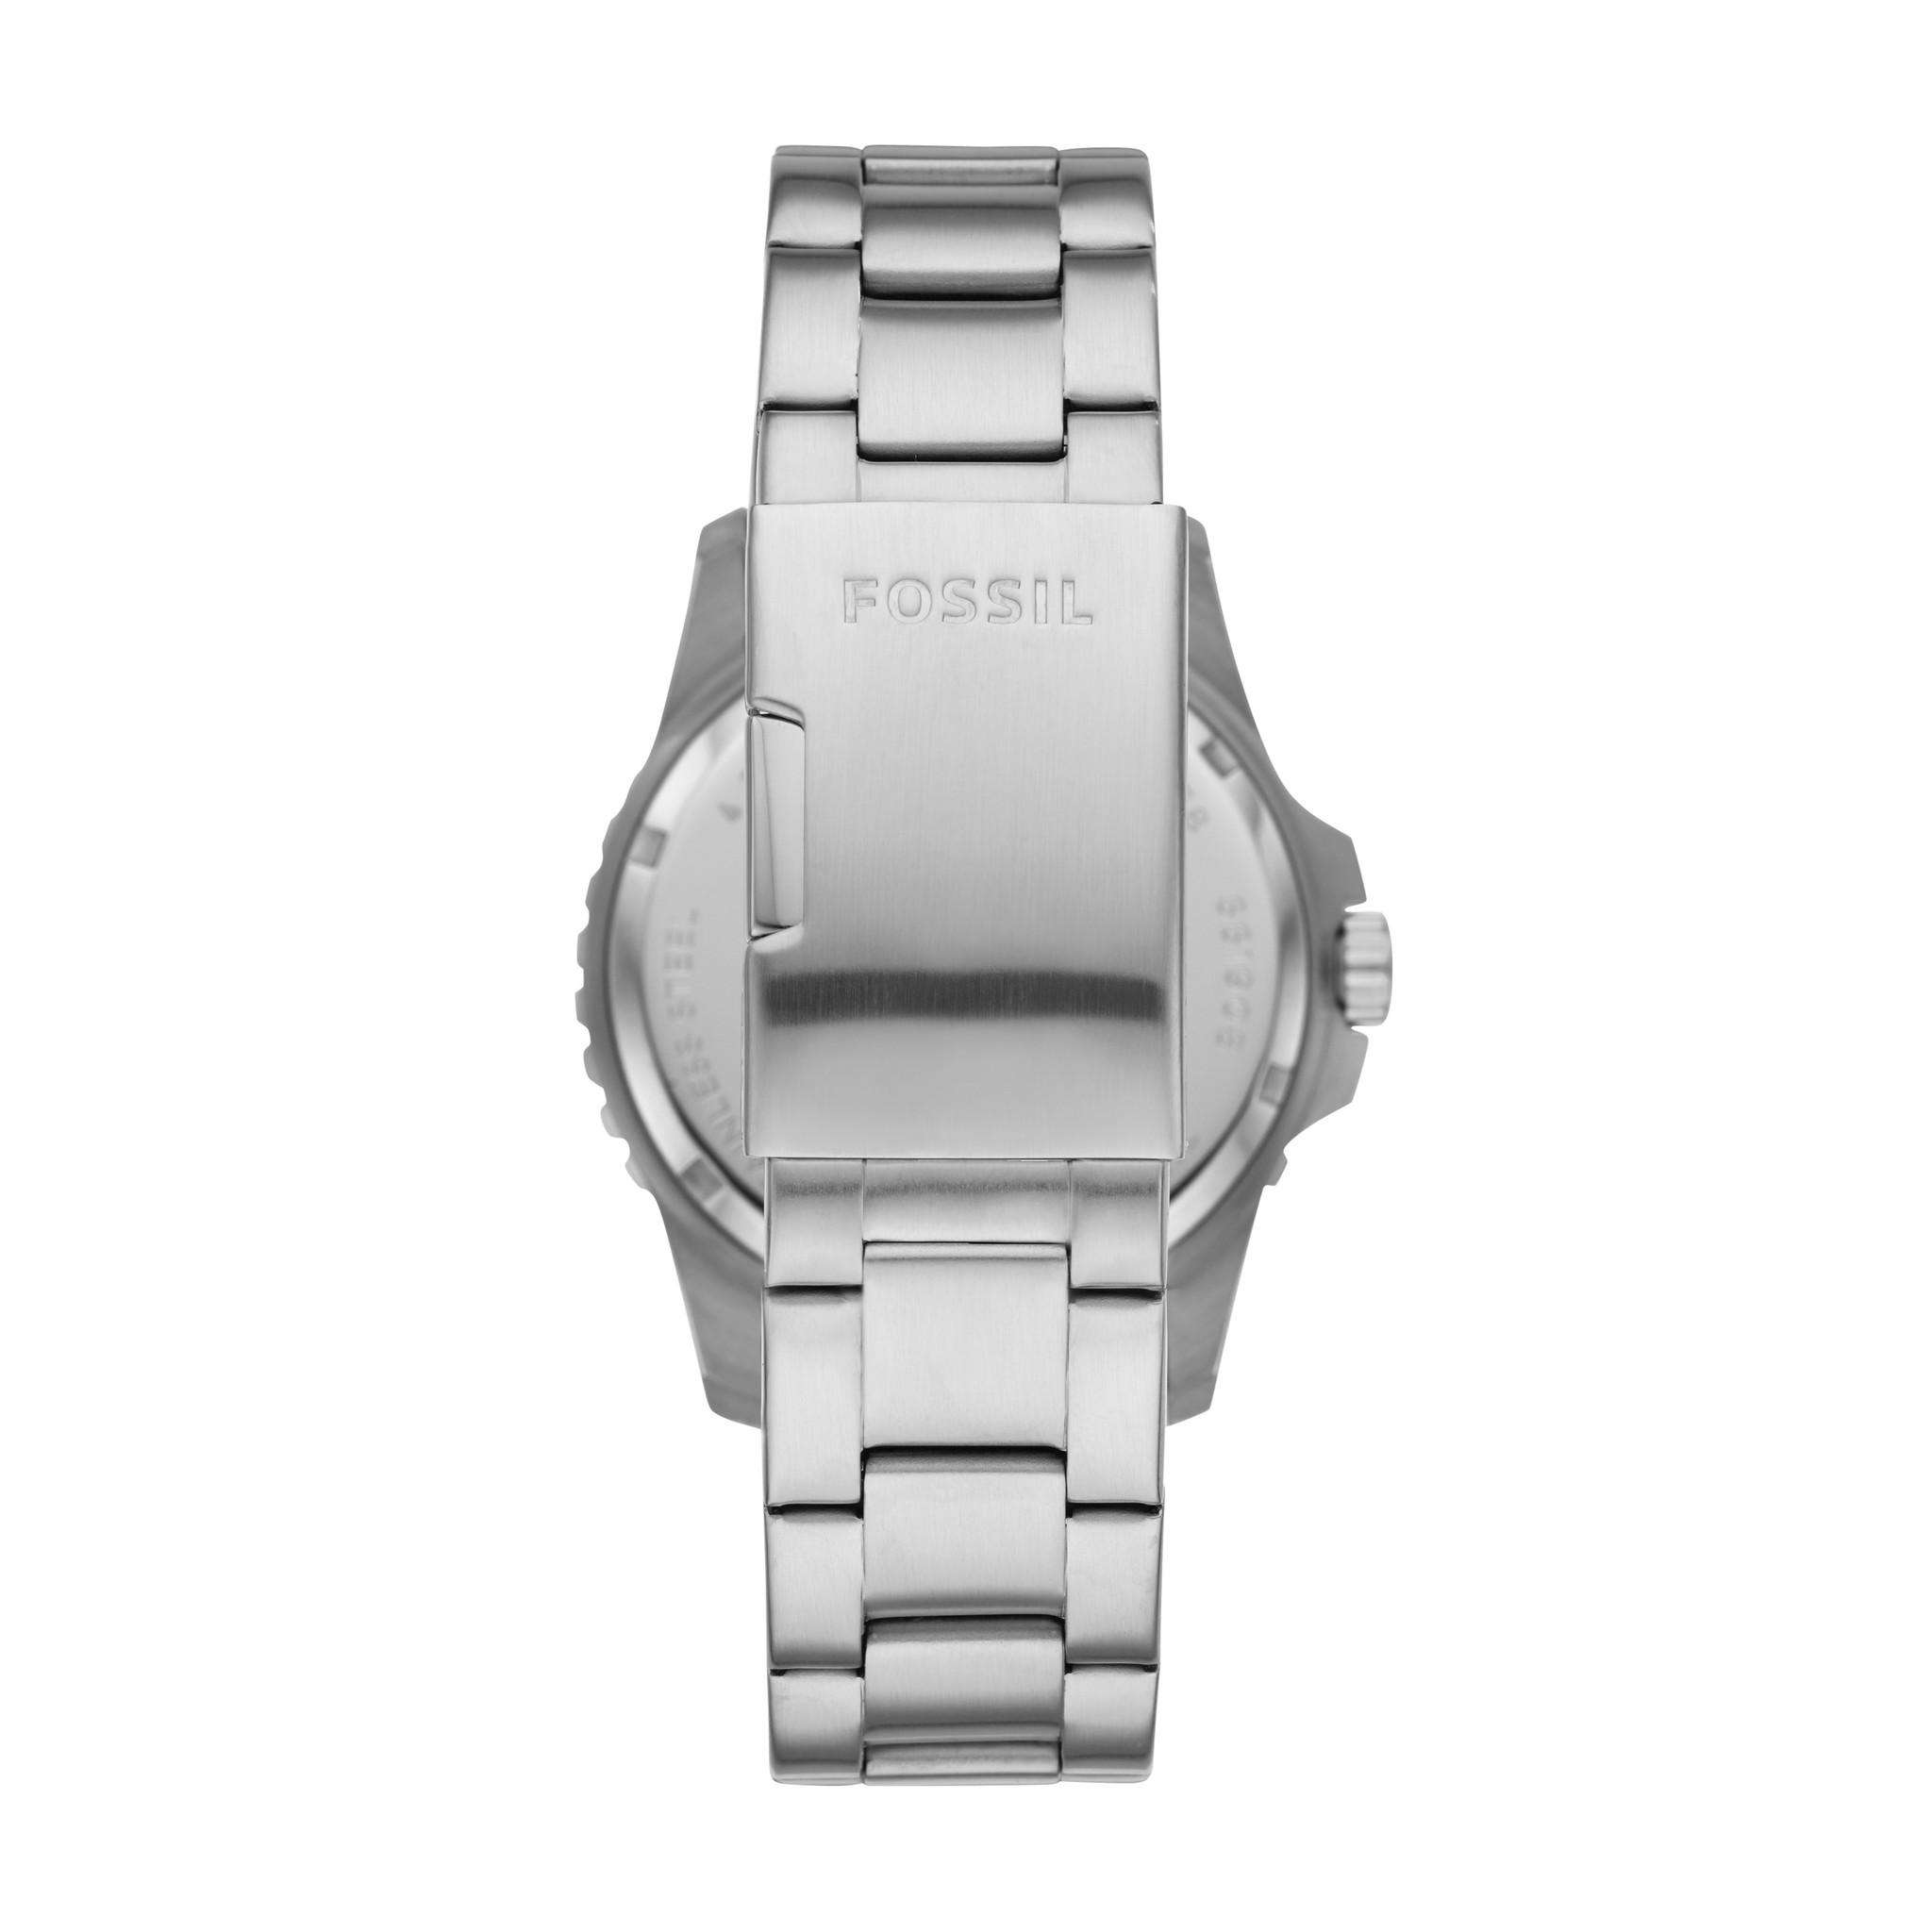 Fossil Heren Horloge Fb - 01 FS5668-2